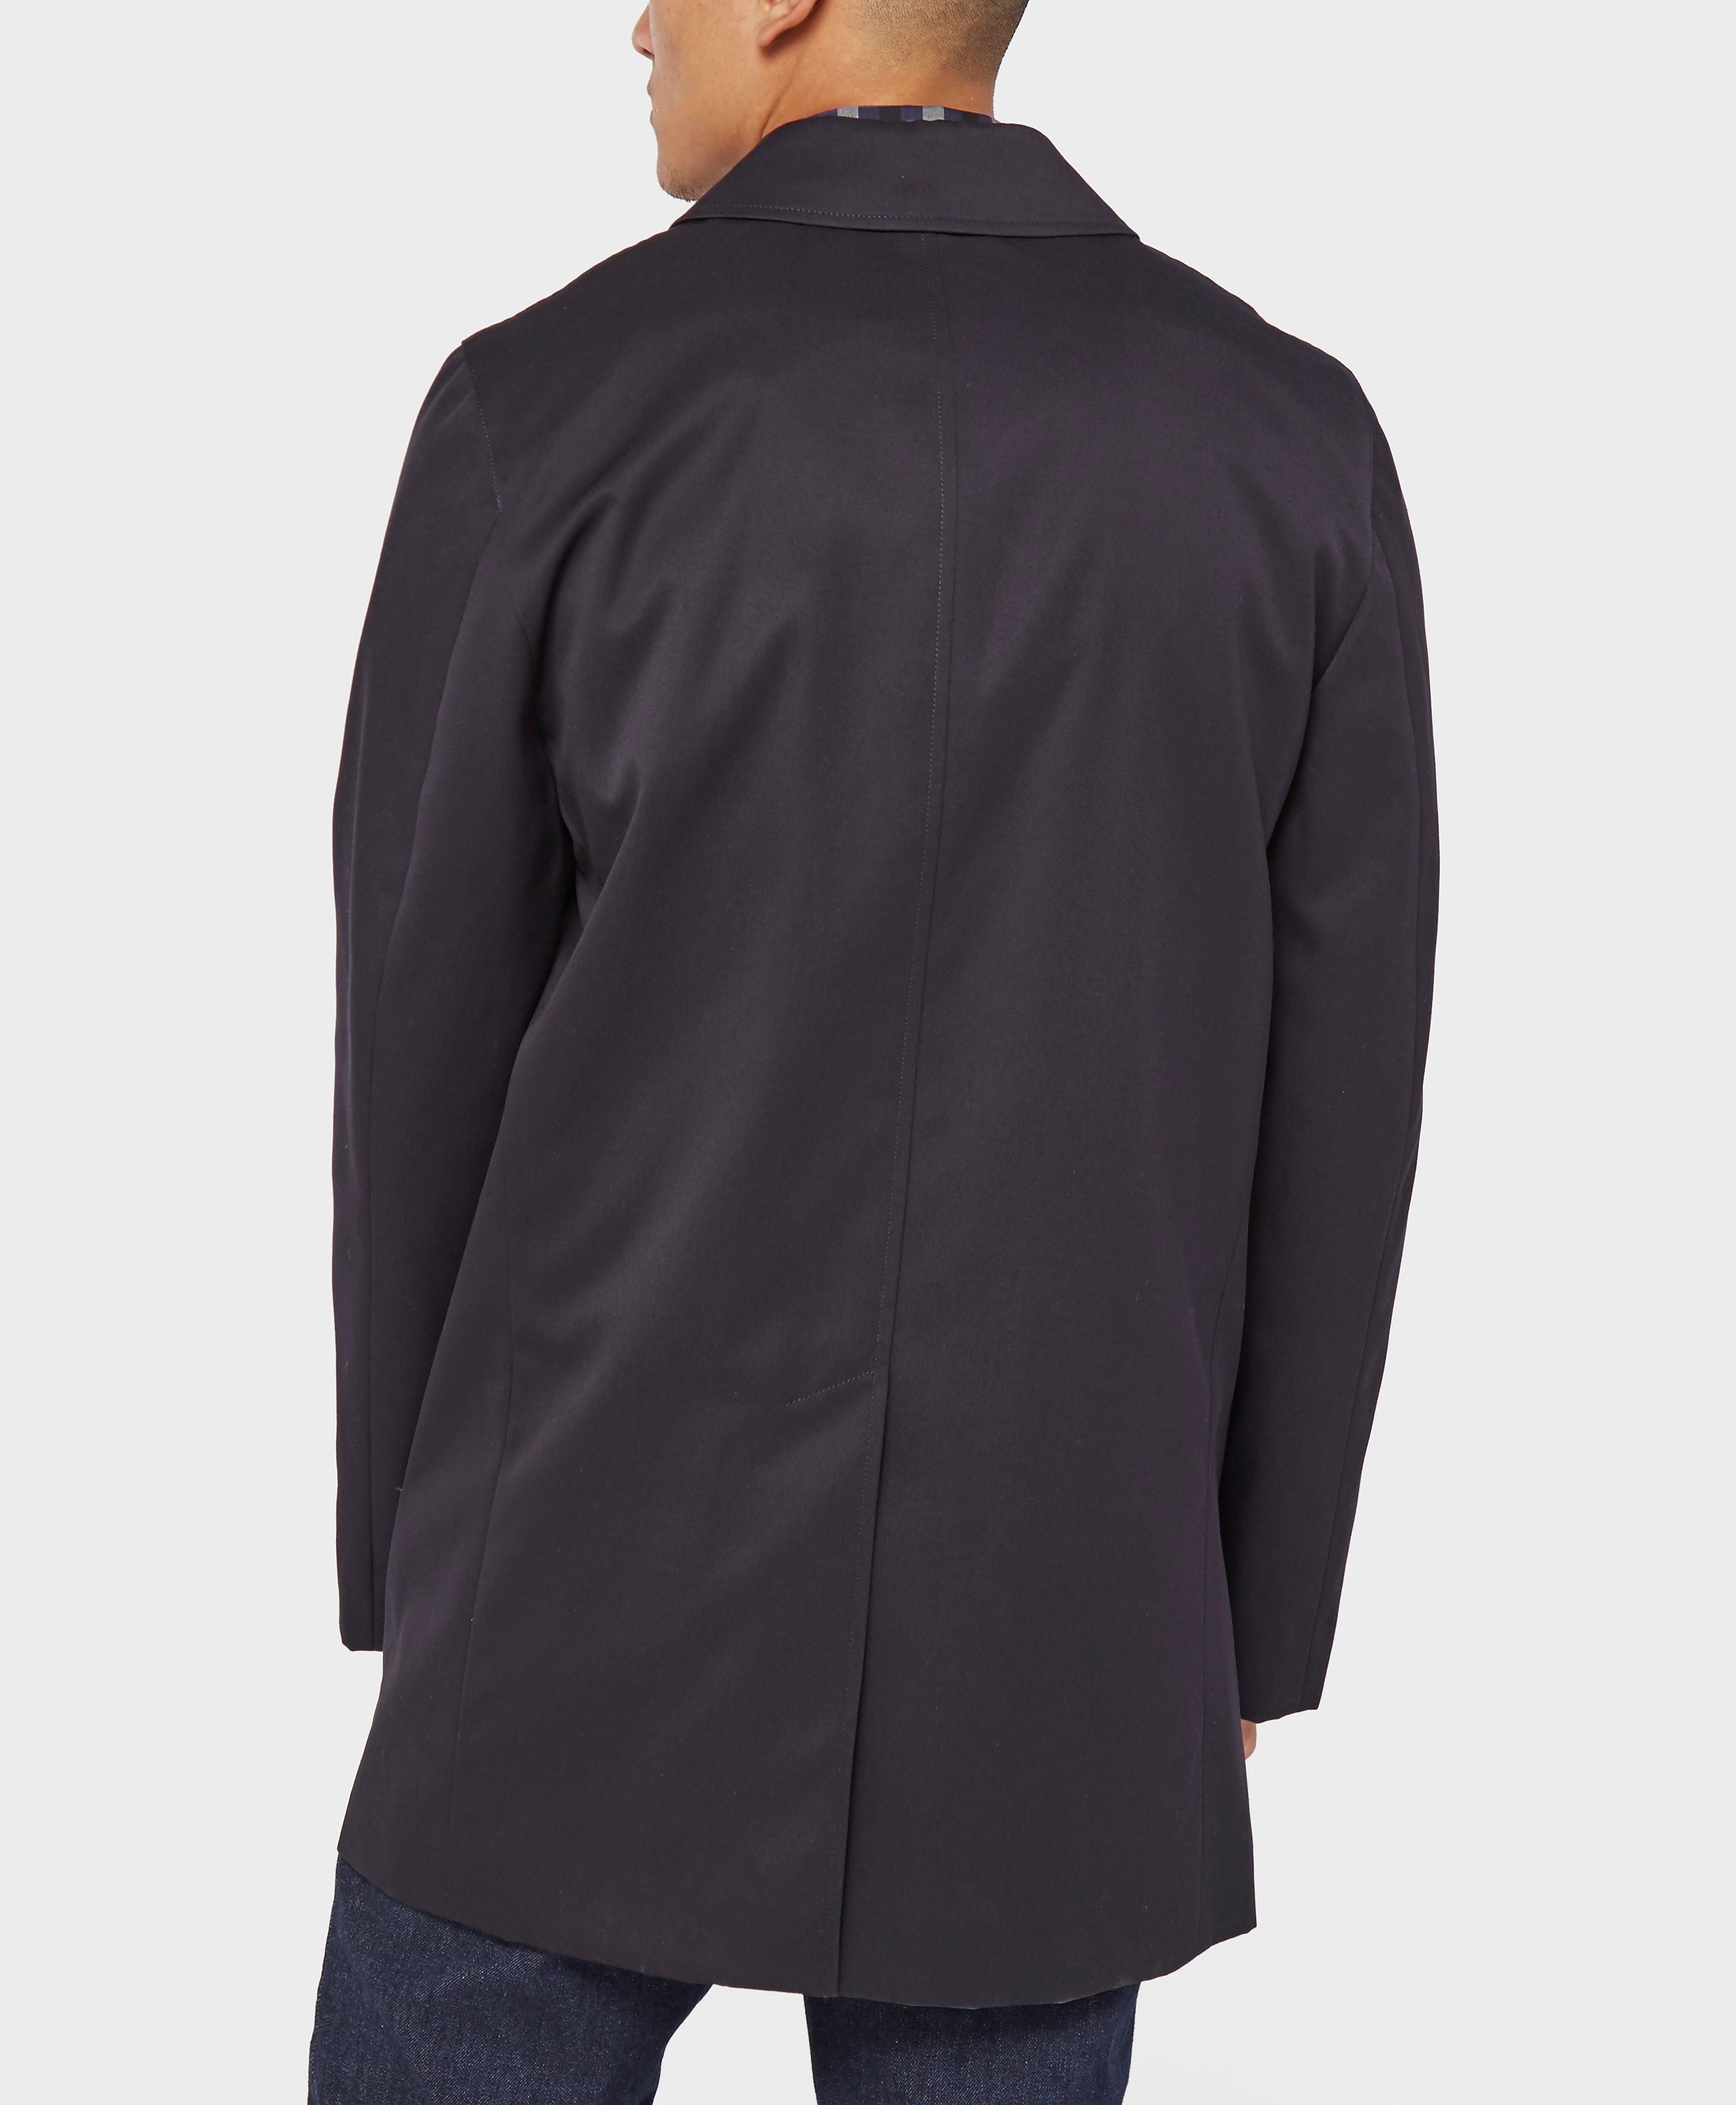 Aquascutum Berkeley Trench Coat